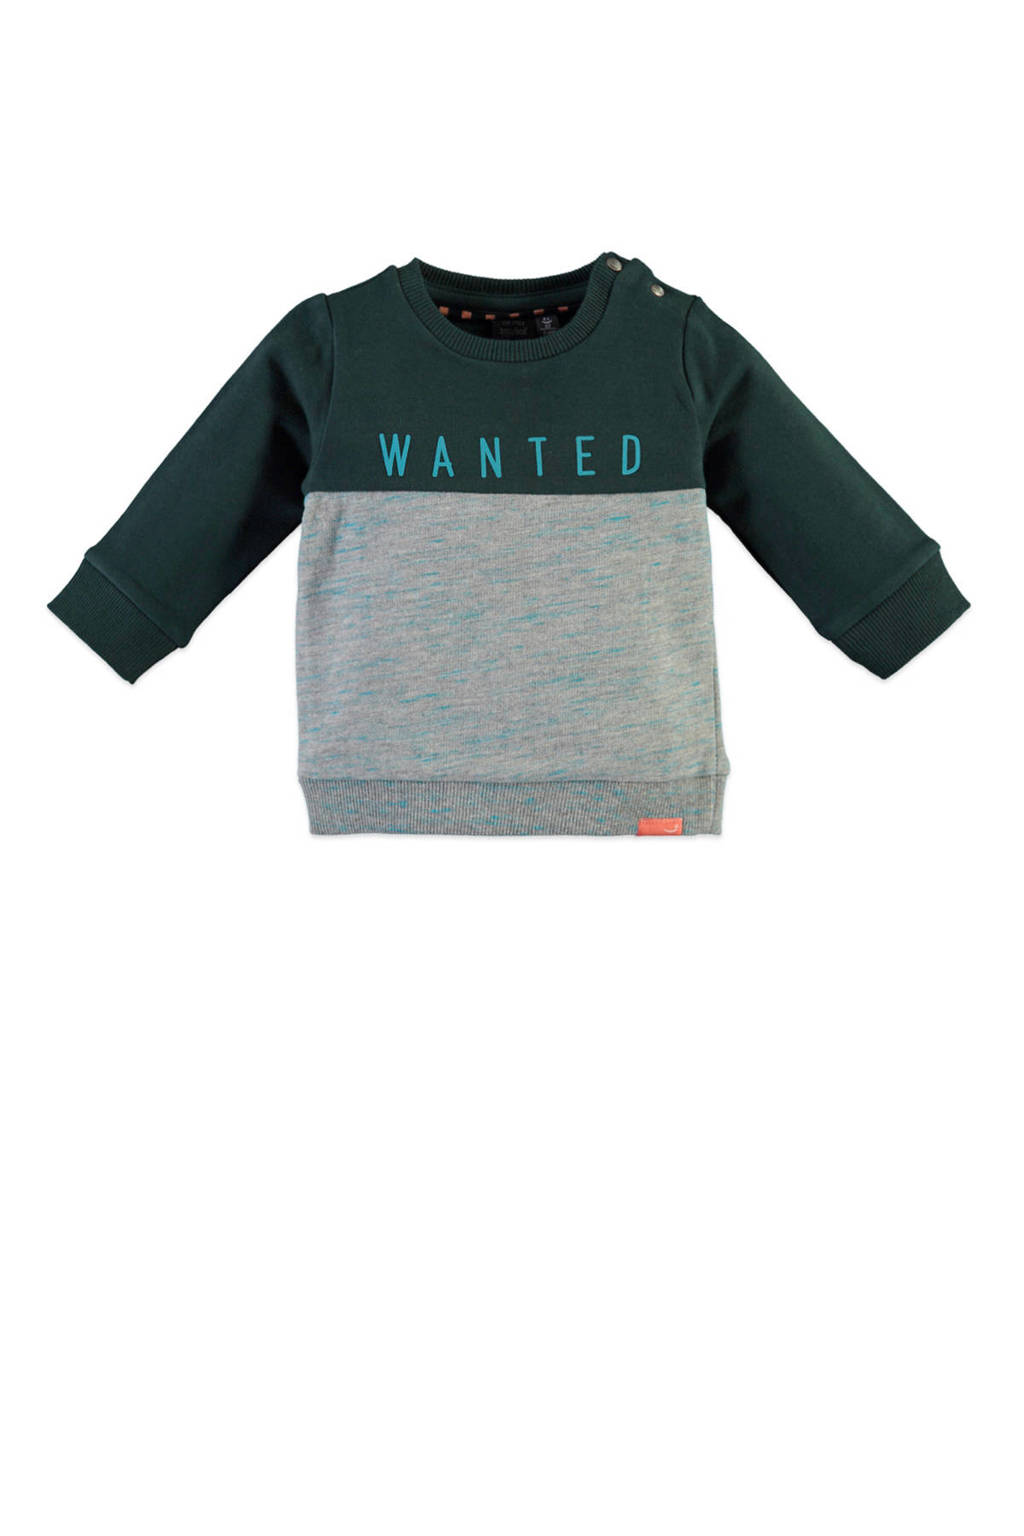 Babyface sweater grijs/donkergroen/blauw, Grijs/donkergroen/blauw